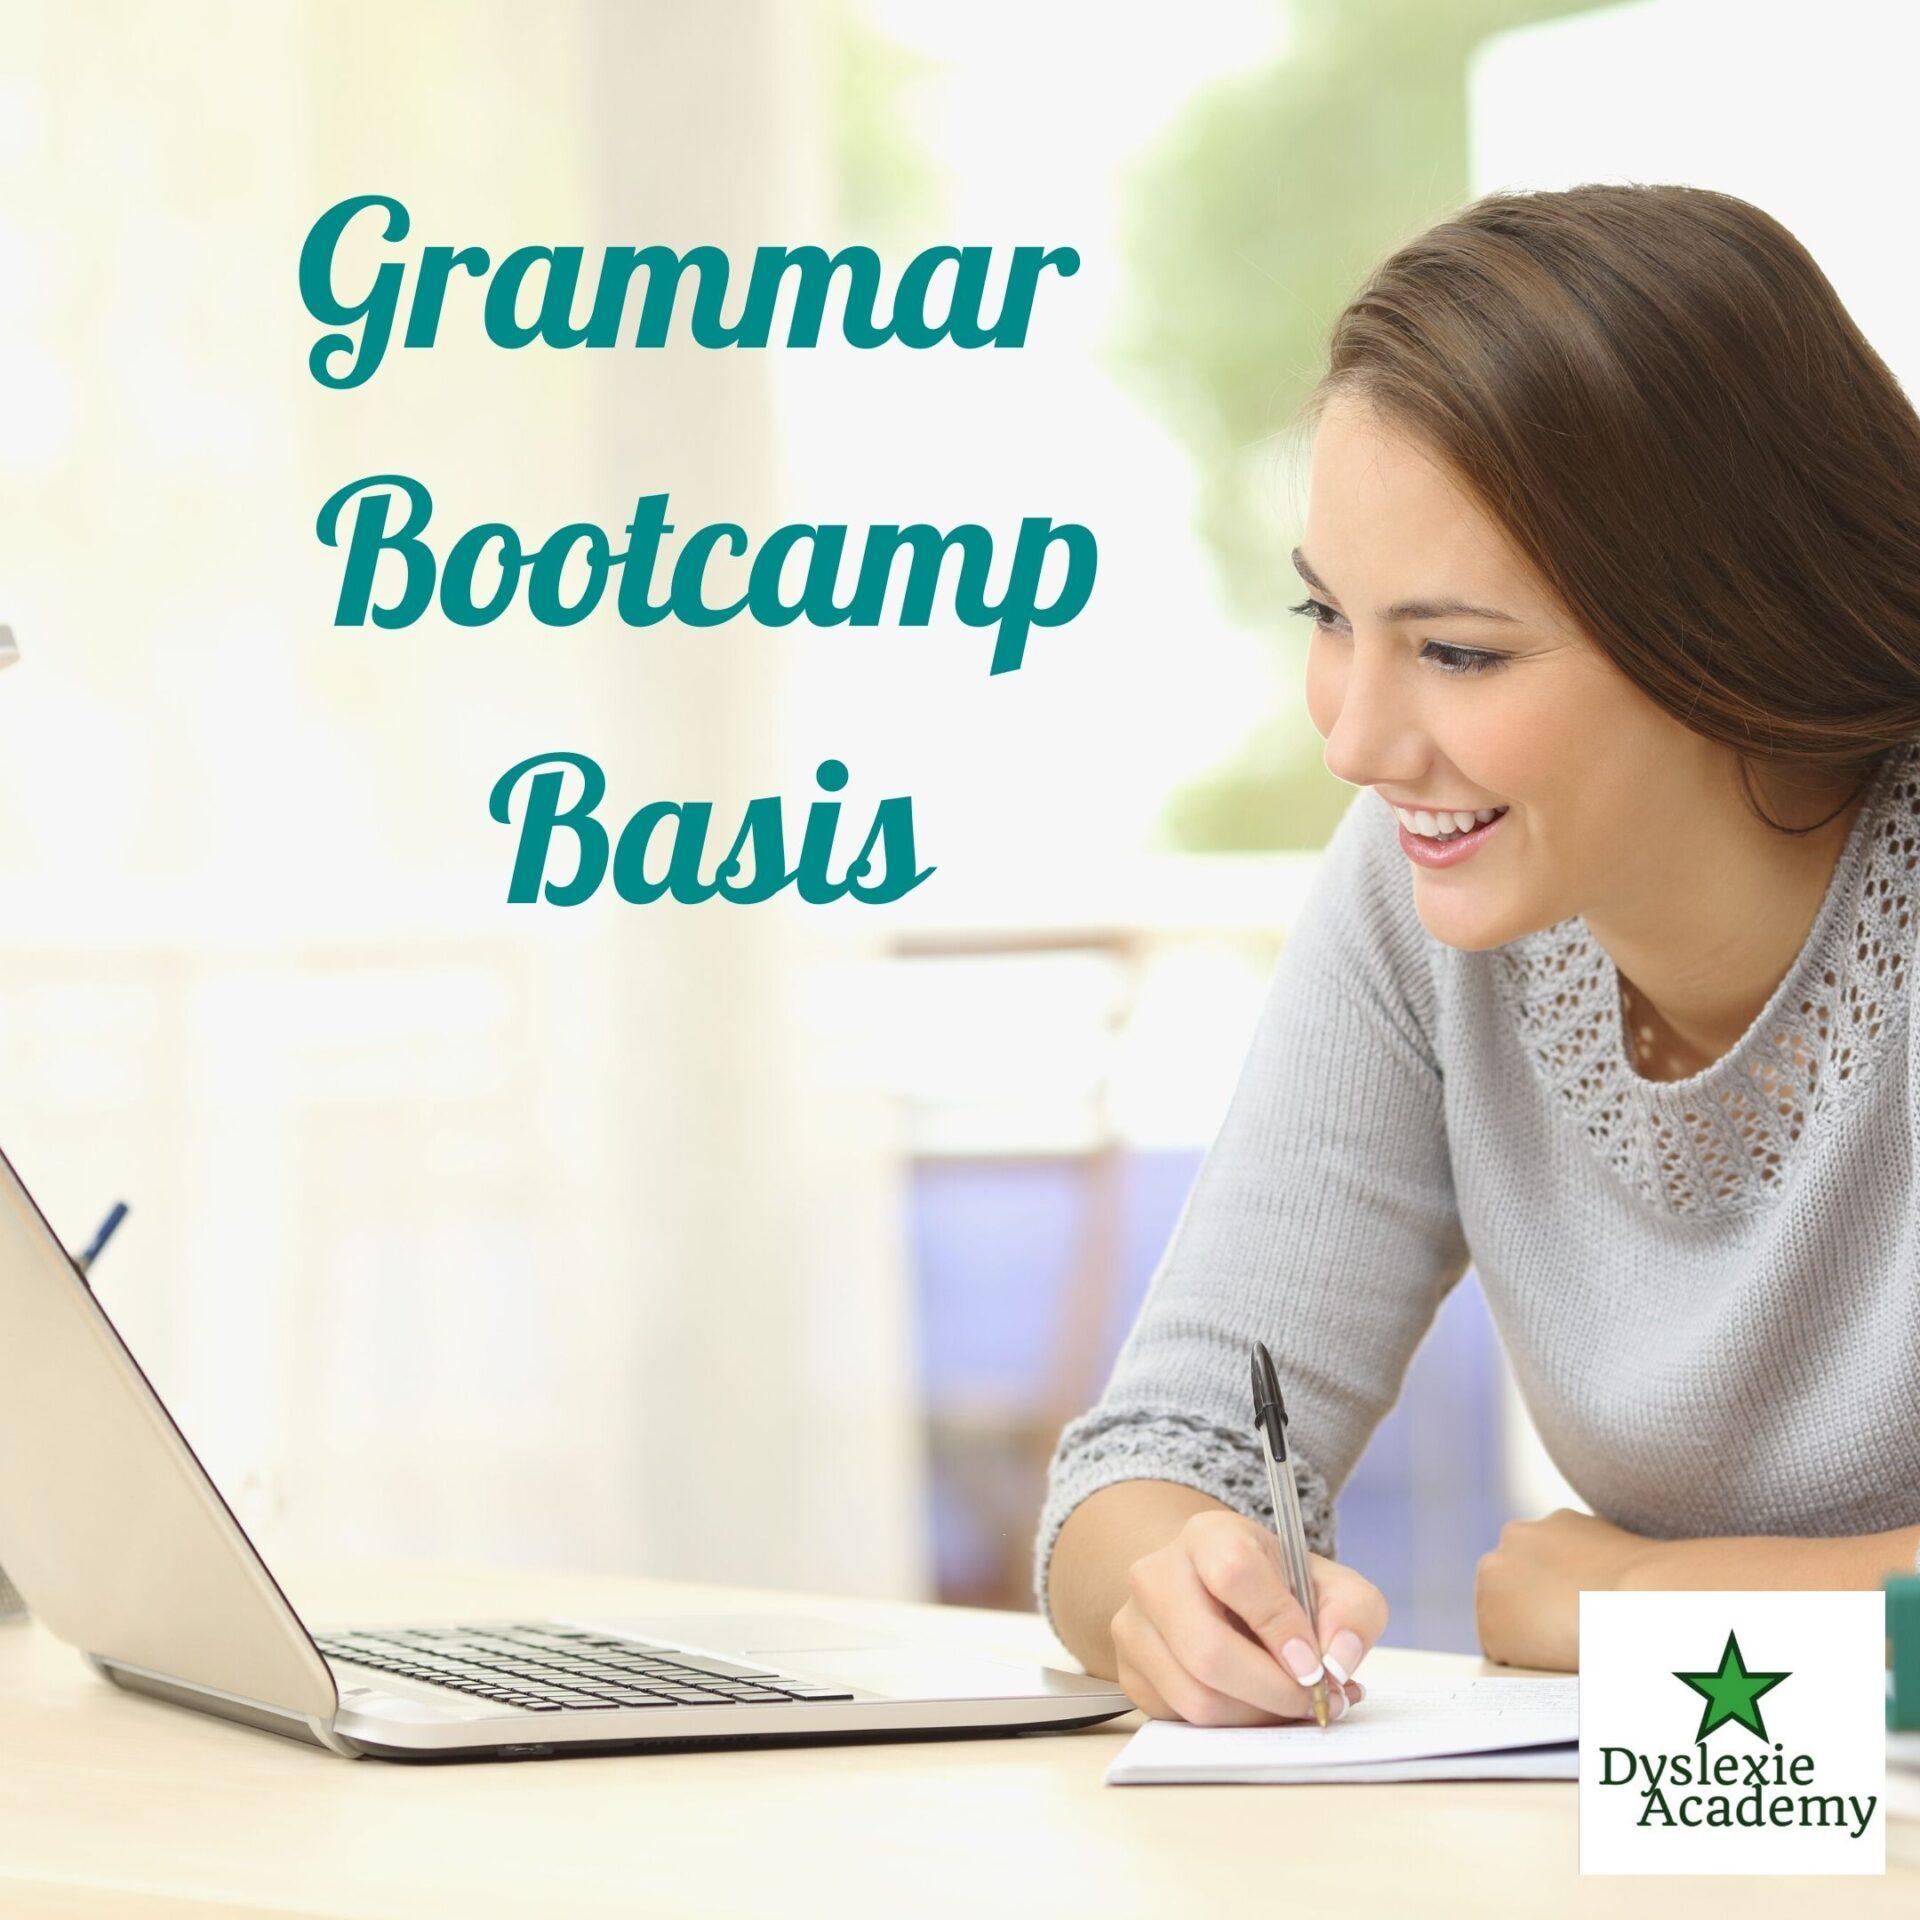 Grammar Bootcamp Engels Basis